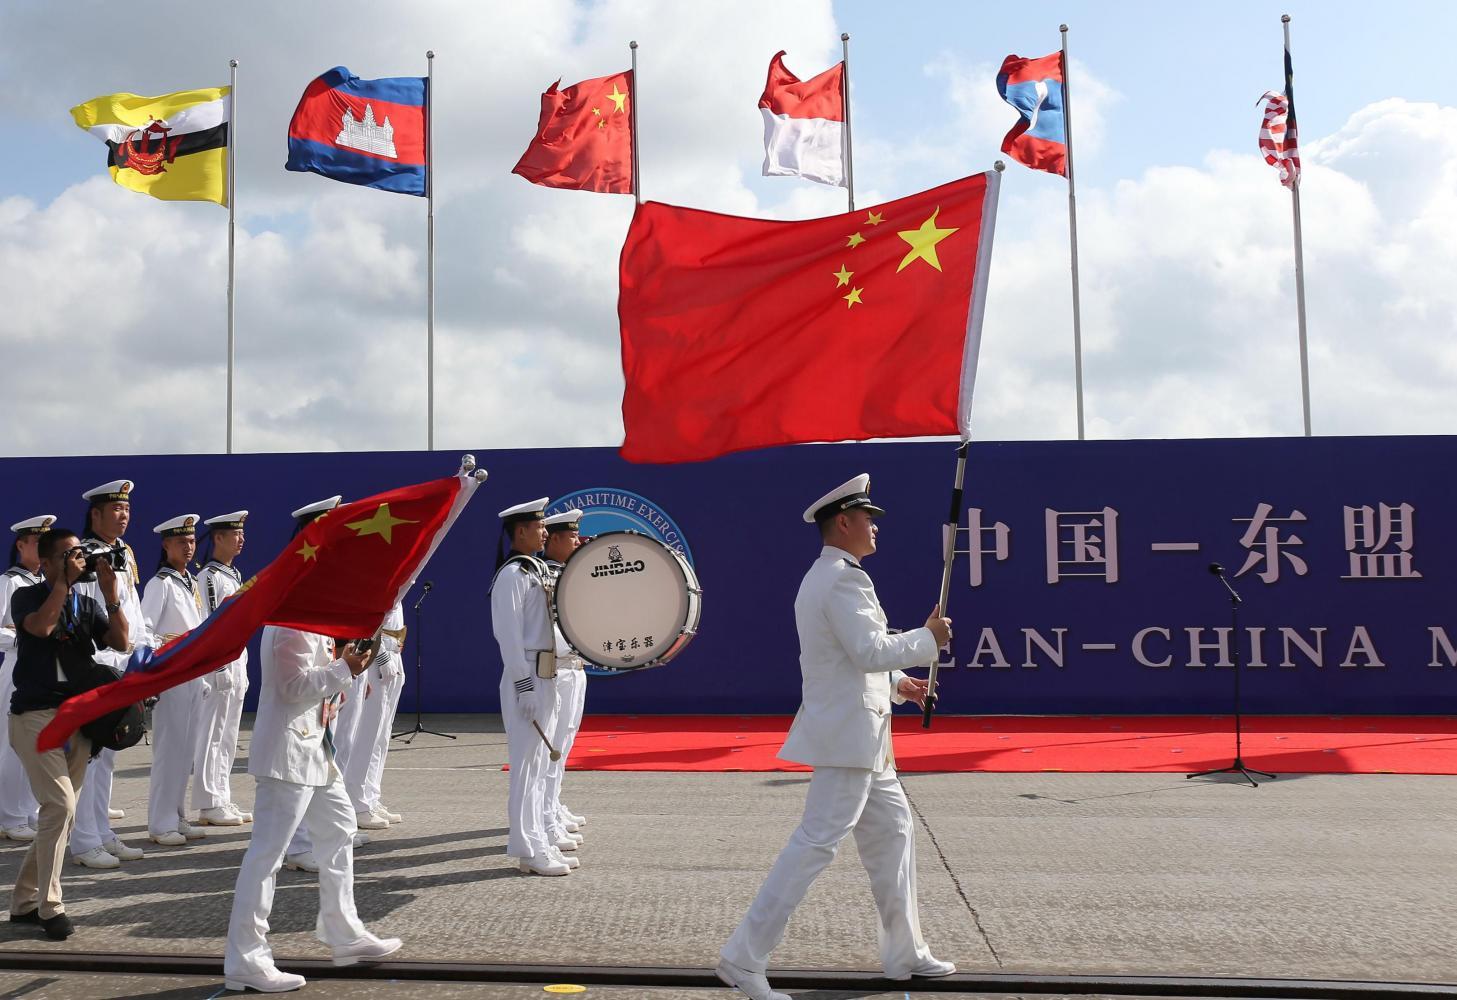 Asean, China promote Asian values